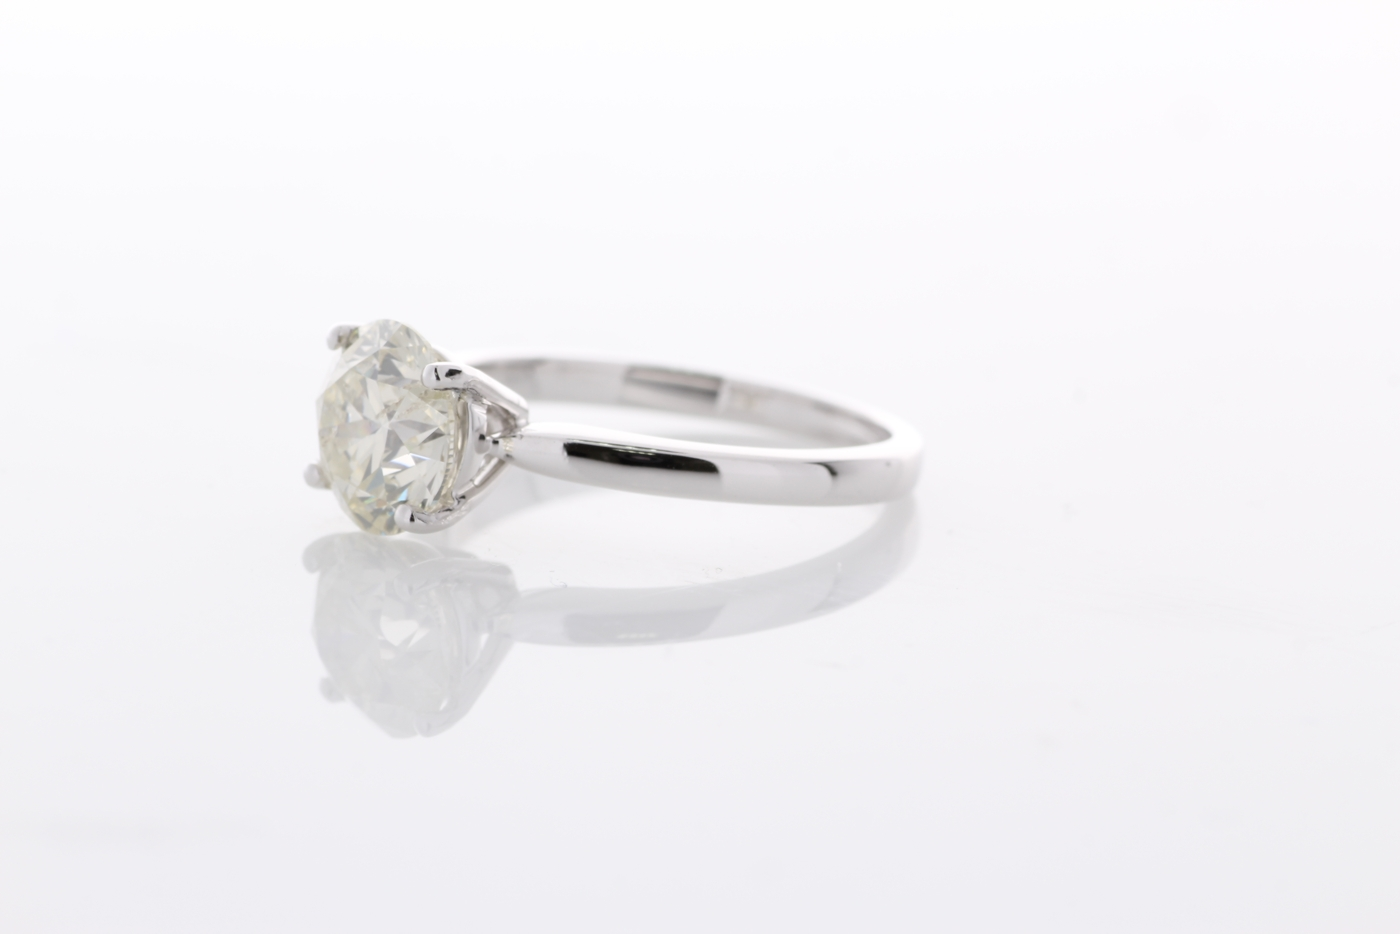 18ct White Gold Single Stone Prong Set Diamond Ring 2.02 Carats - Image 2 of 5